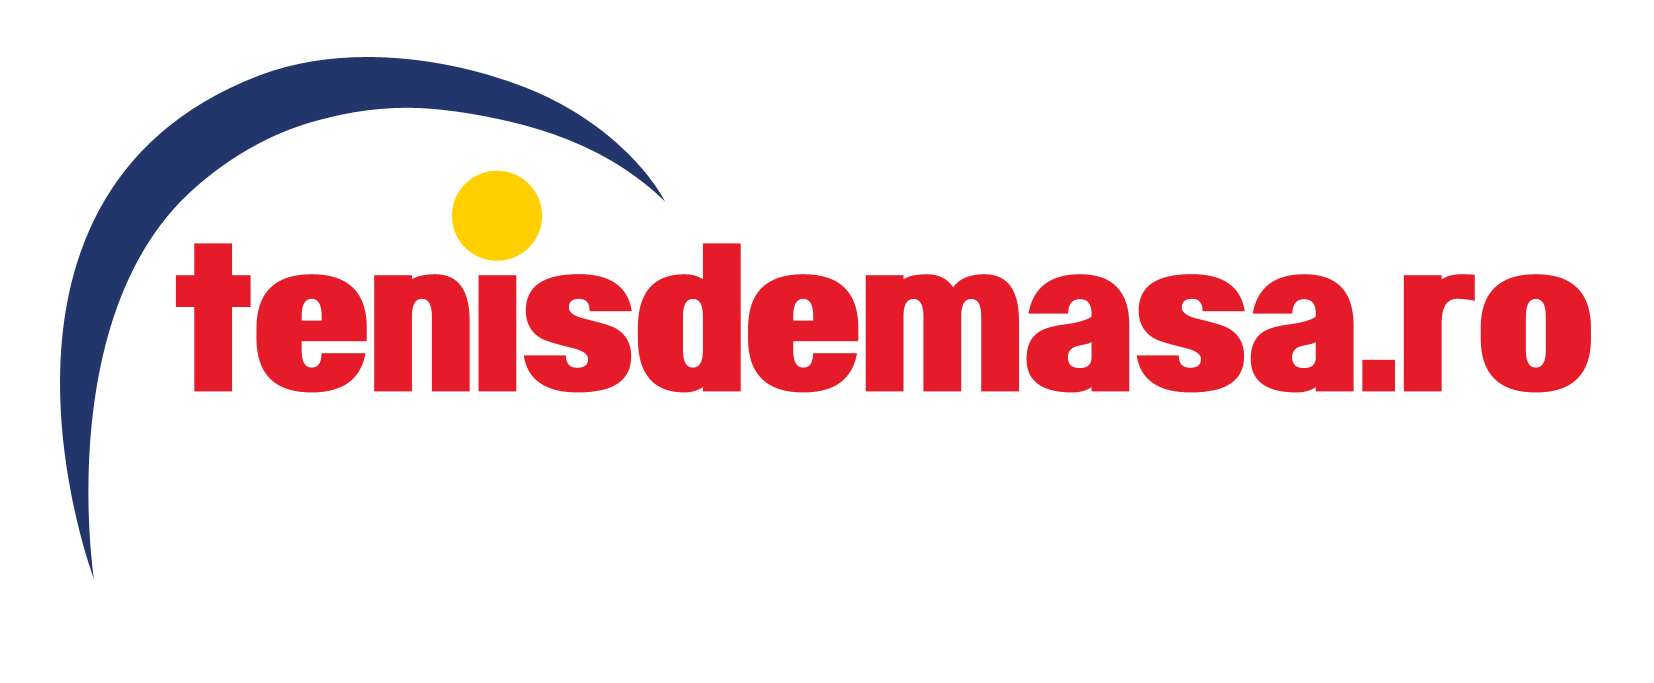 Forum tenisdemasa.ro